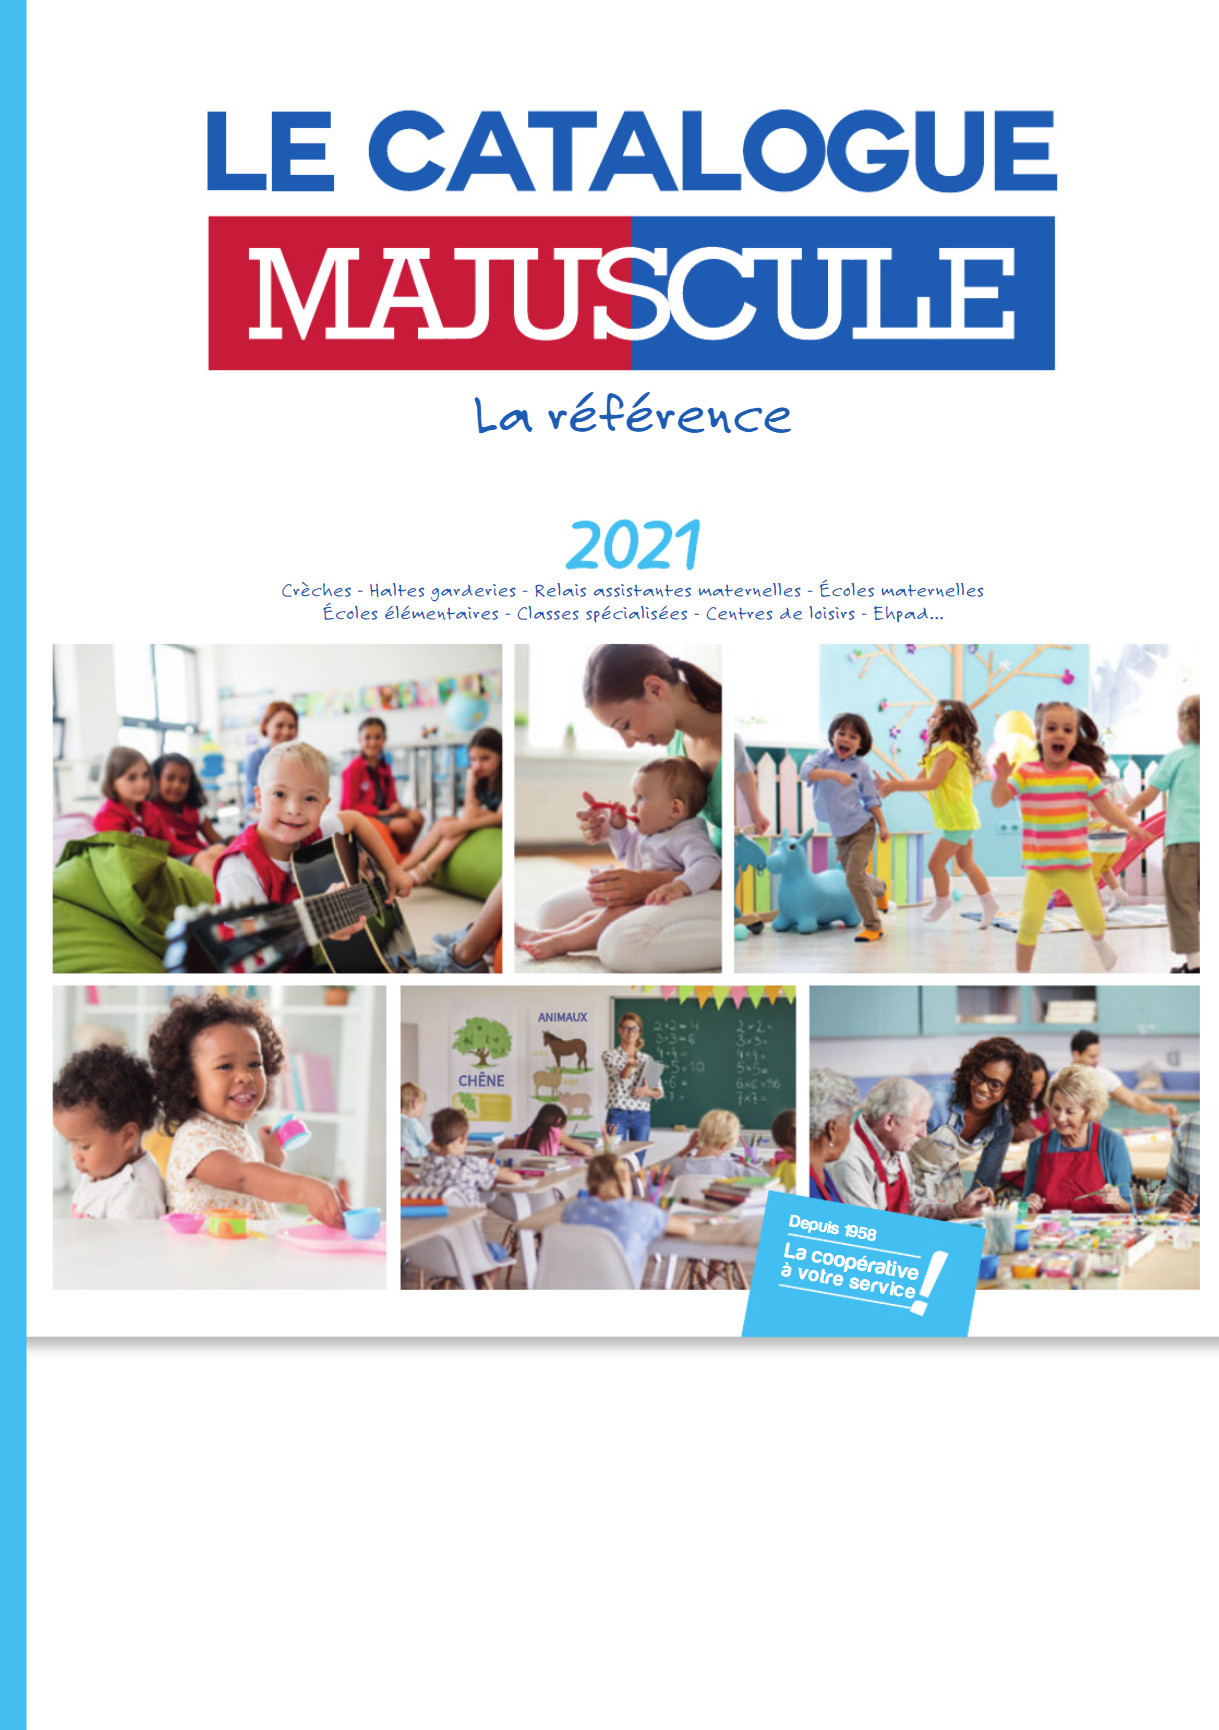 fouritures-scolaires-2021